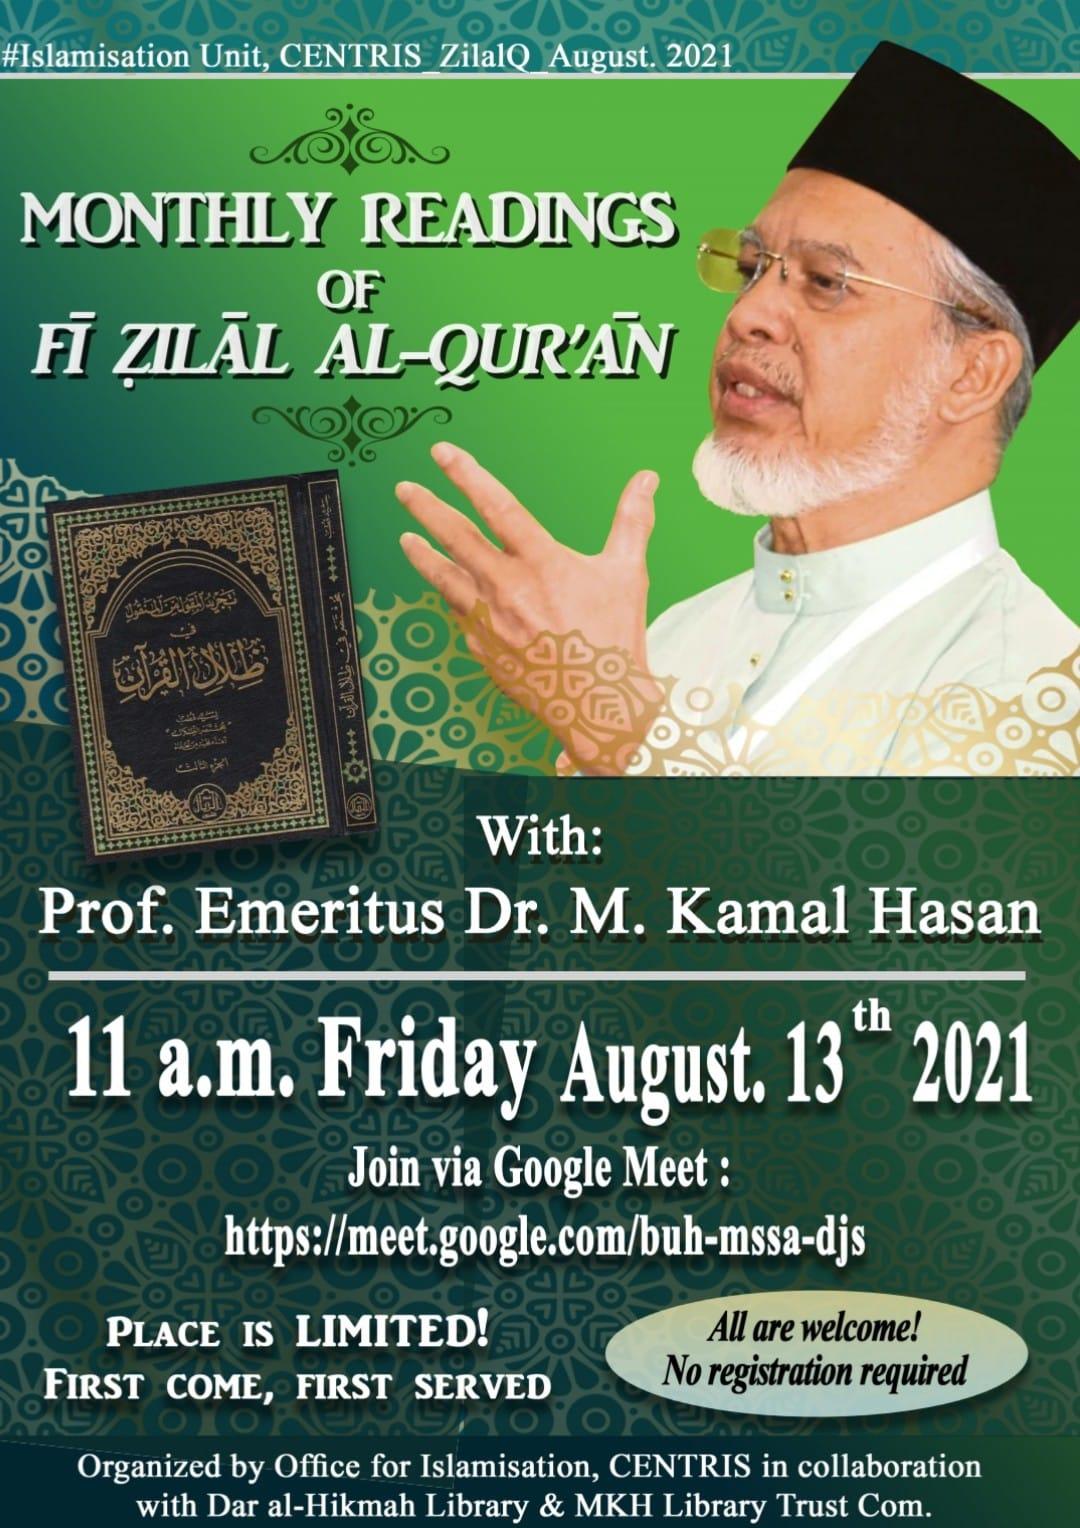 MONTHLY READINGS OF FĪ ẒILĀL AL-QUR'ĀN with PROF. EMERITUS DR. M. KAMAL HASSAN